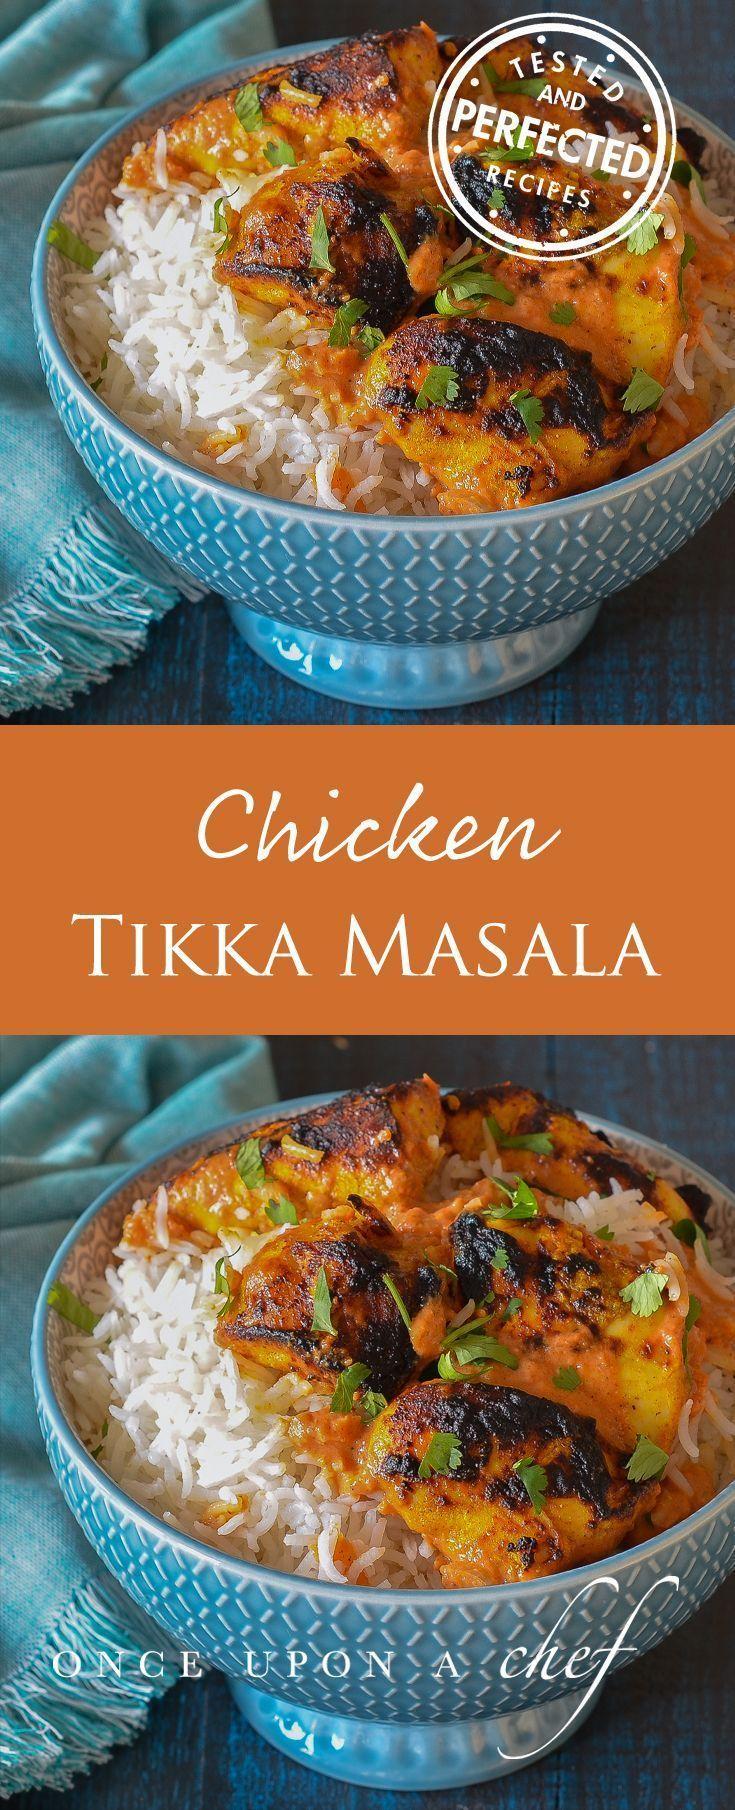 Chicken Tikka Masala #tikkamasala #chickentikka #chickenrecipe #indianrecipe